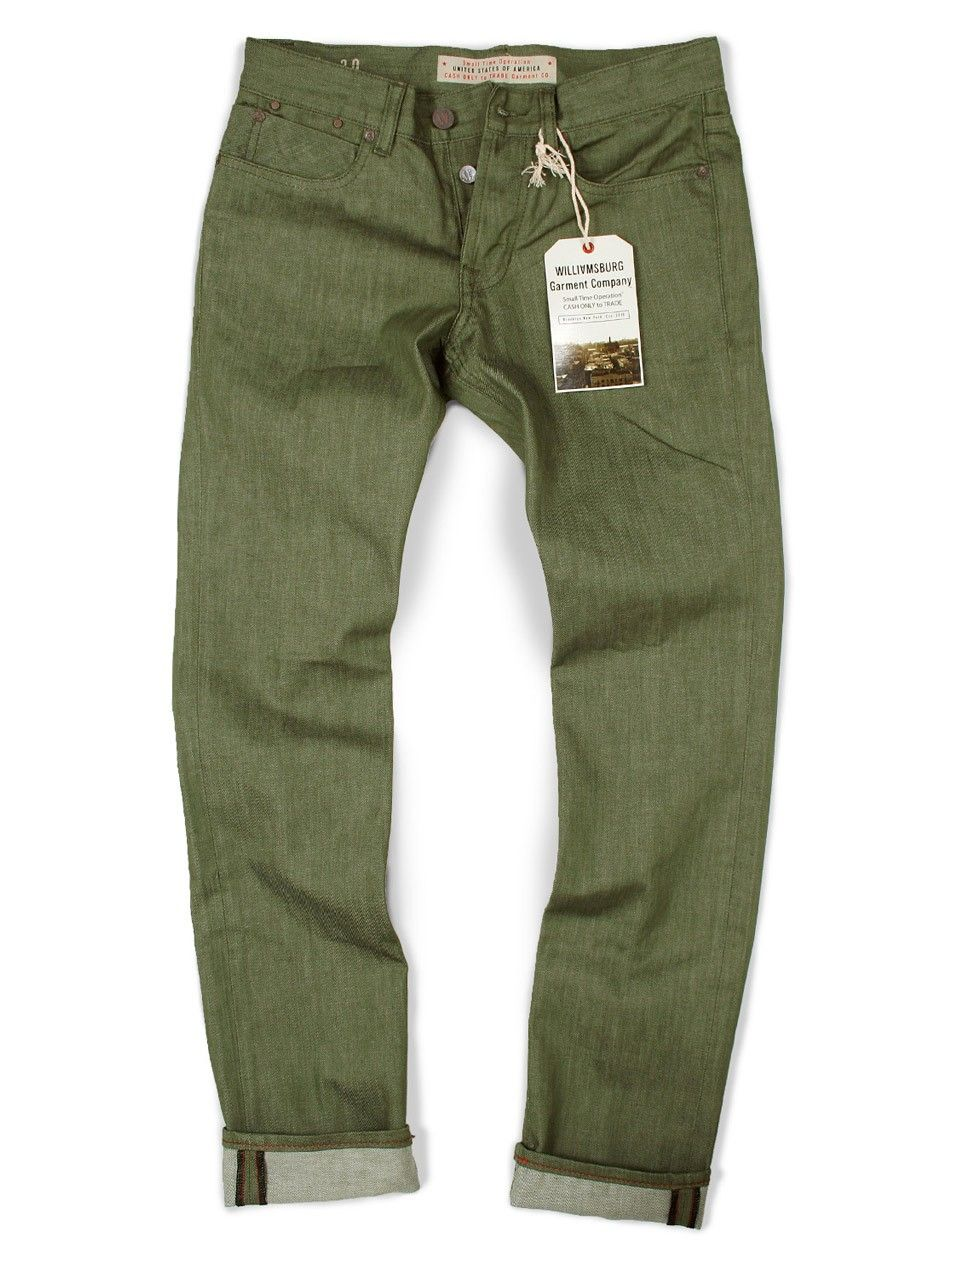 Williamsburg Garment Company, Inc - Raw Sage Green Slim Jeans ...